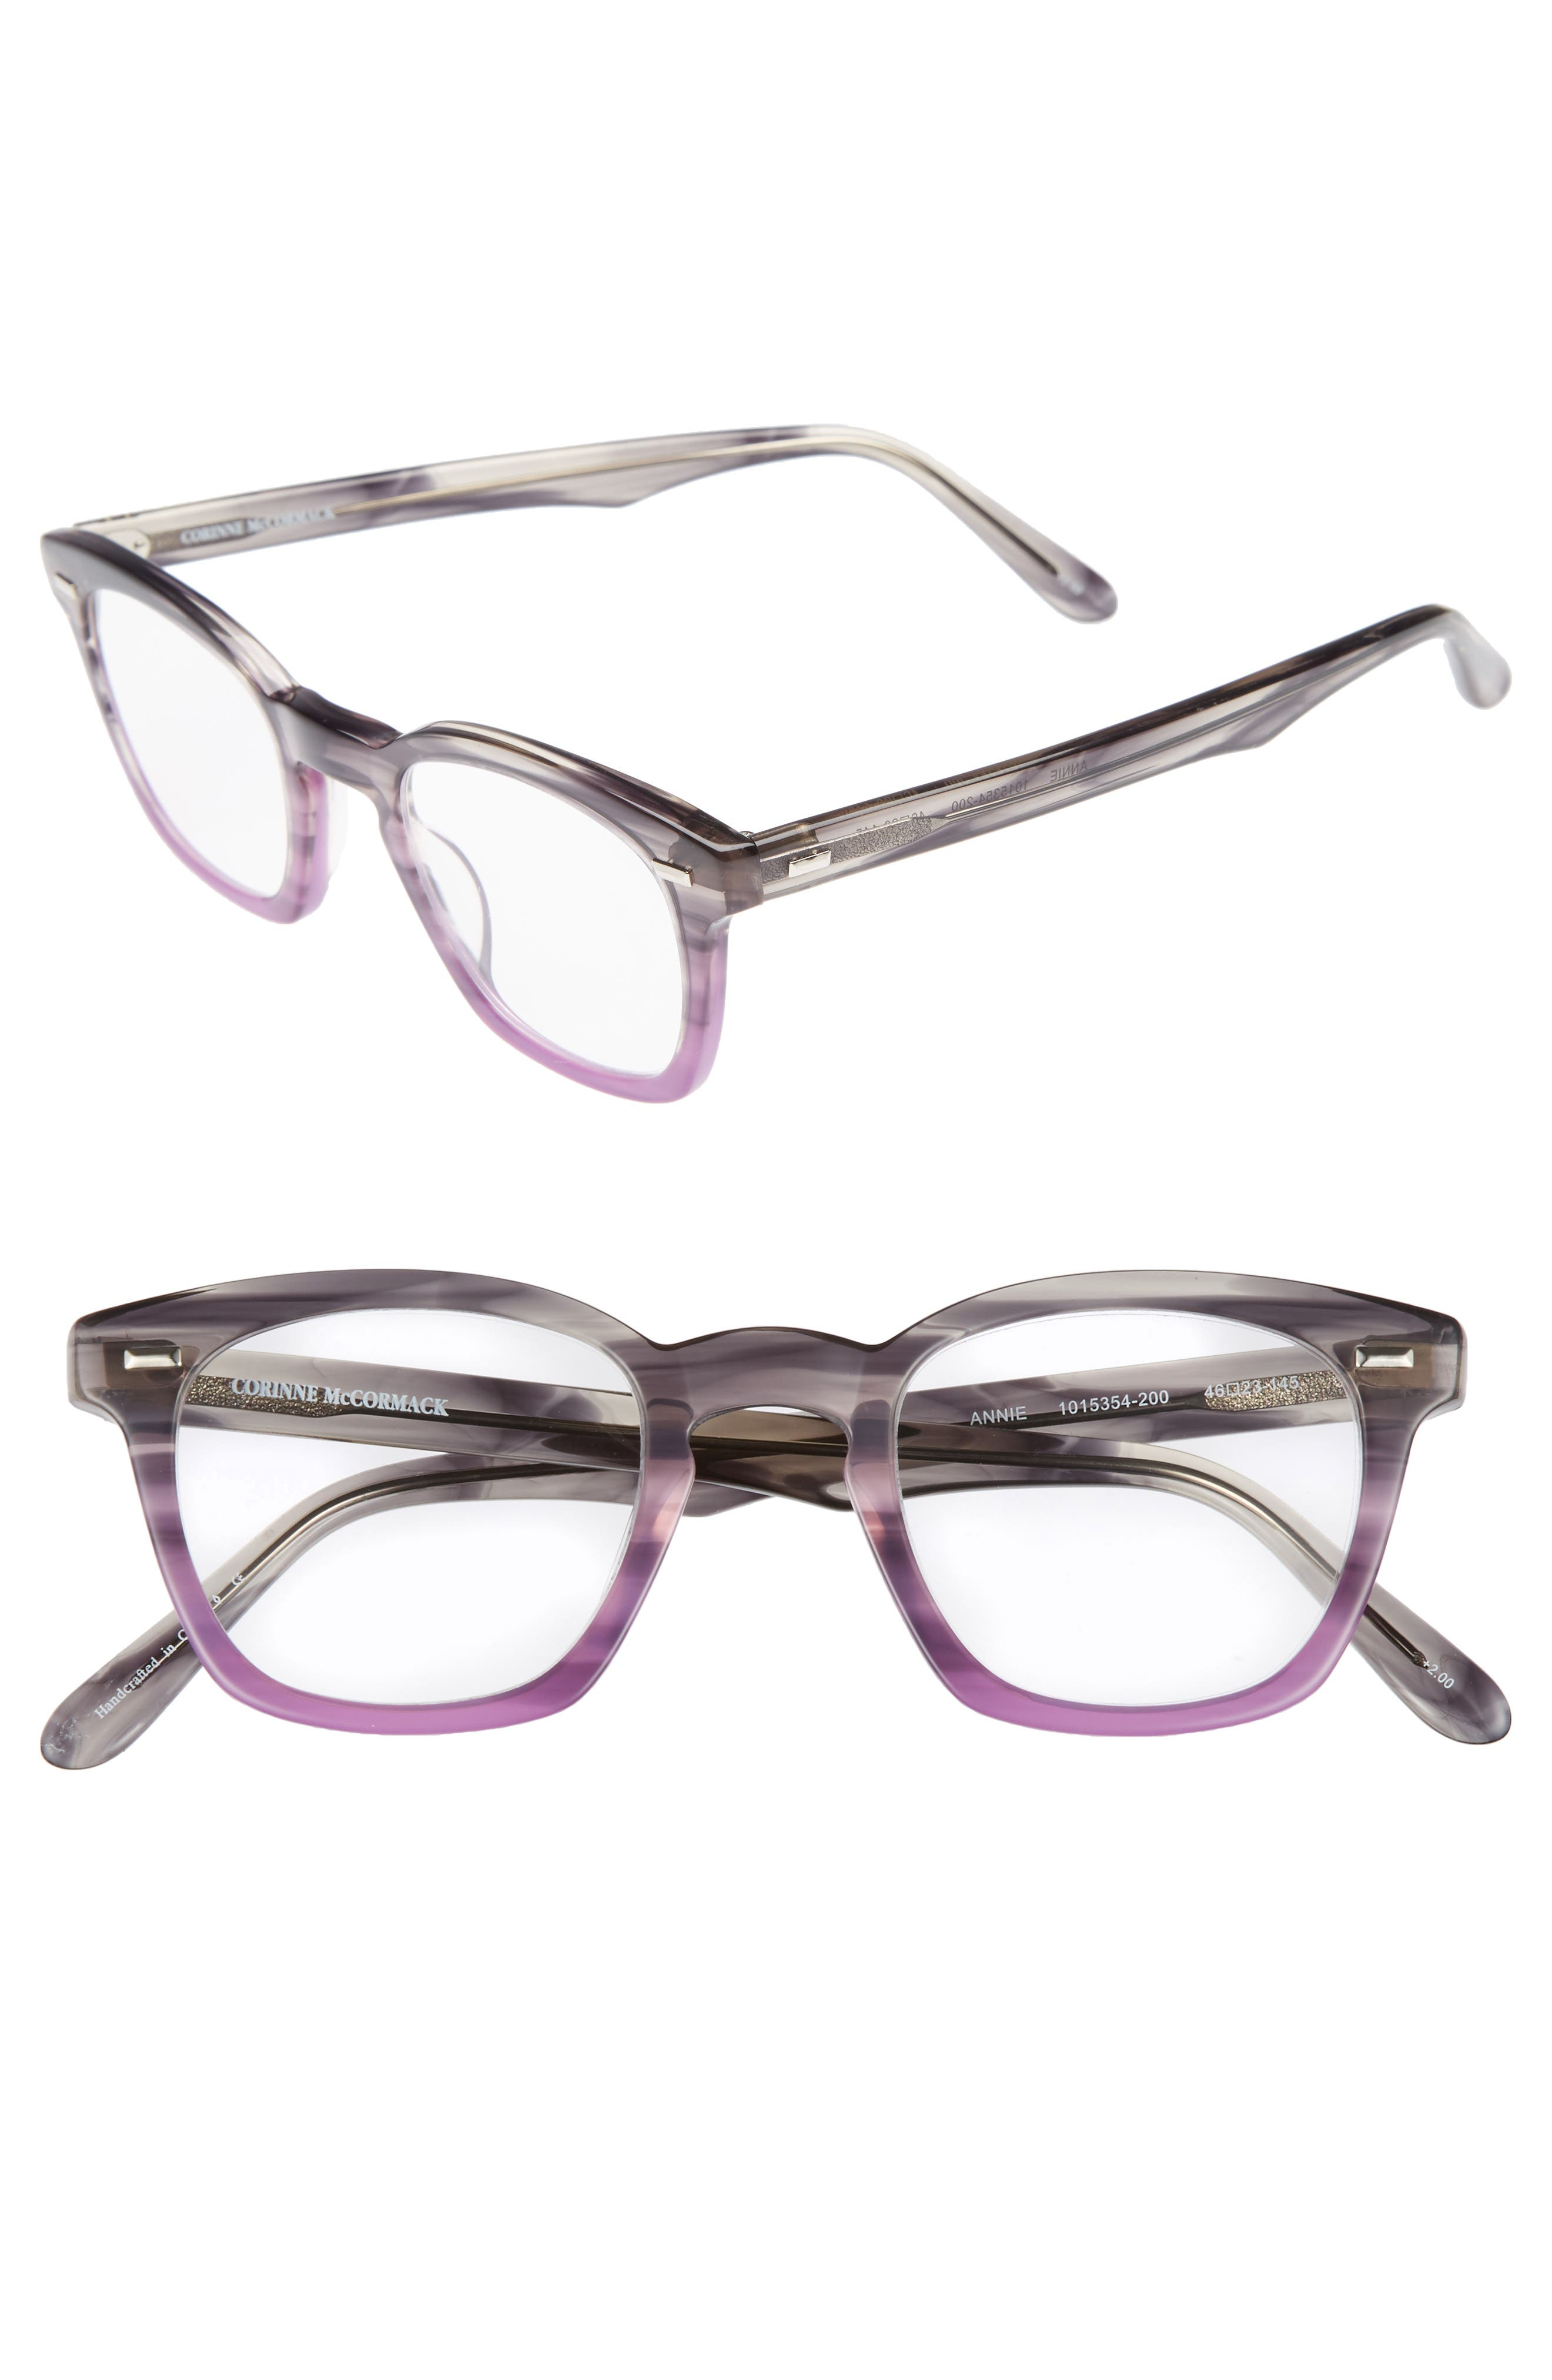 Annie 46mm Reading Glasses,                             Main thumbnail 1, color,                             020